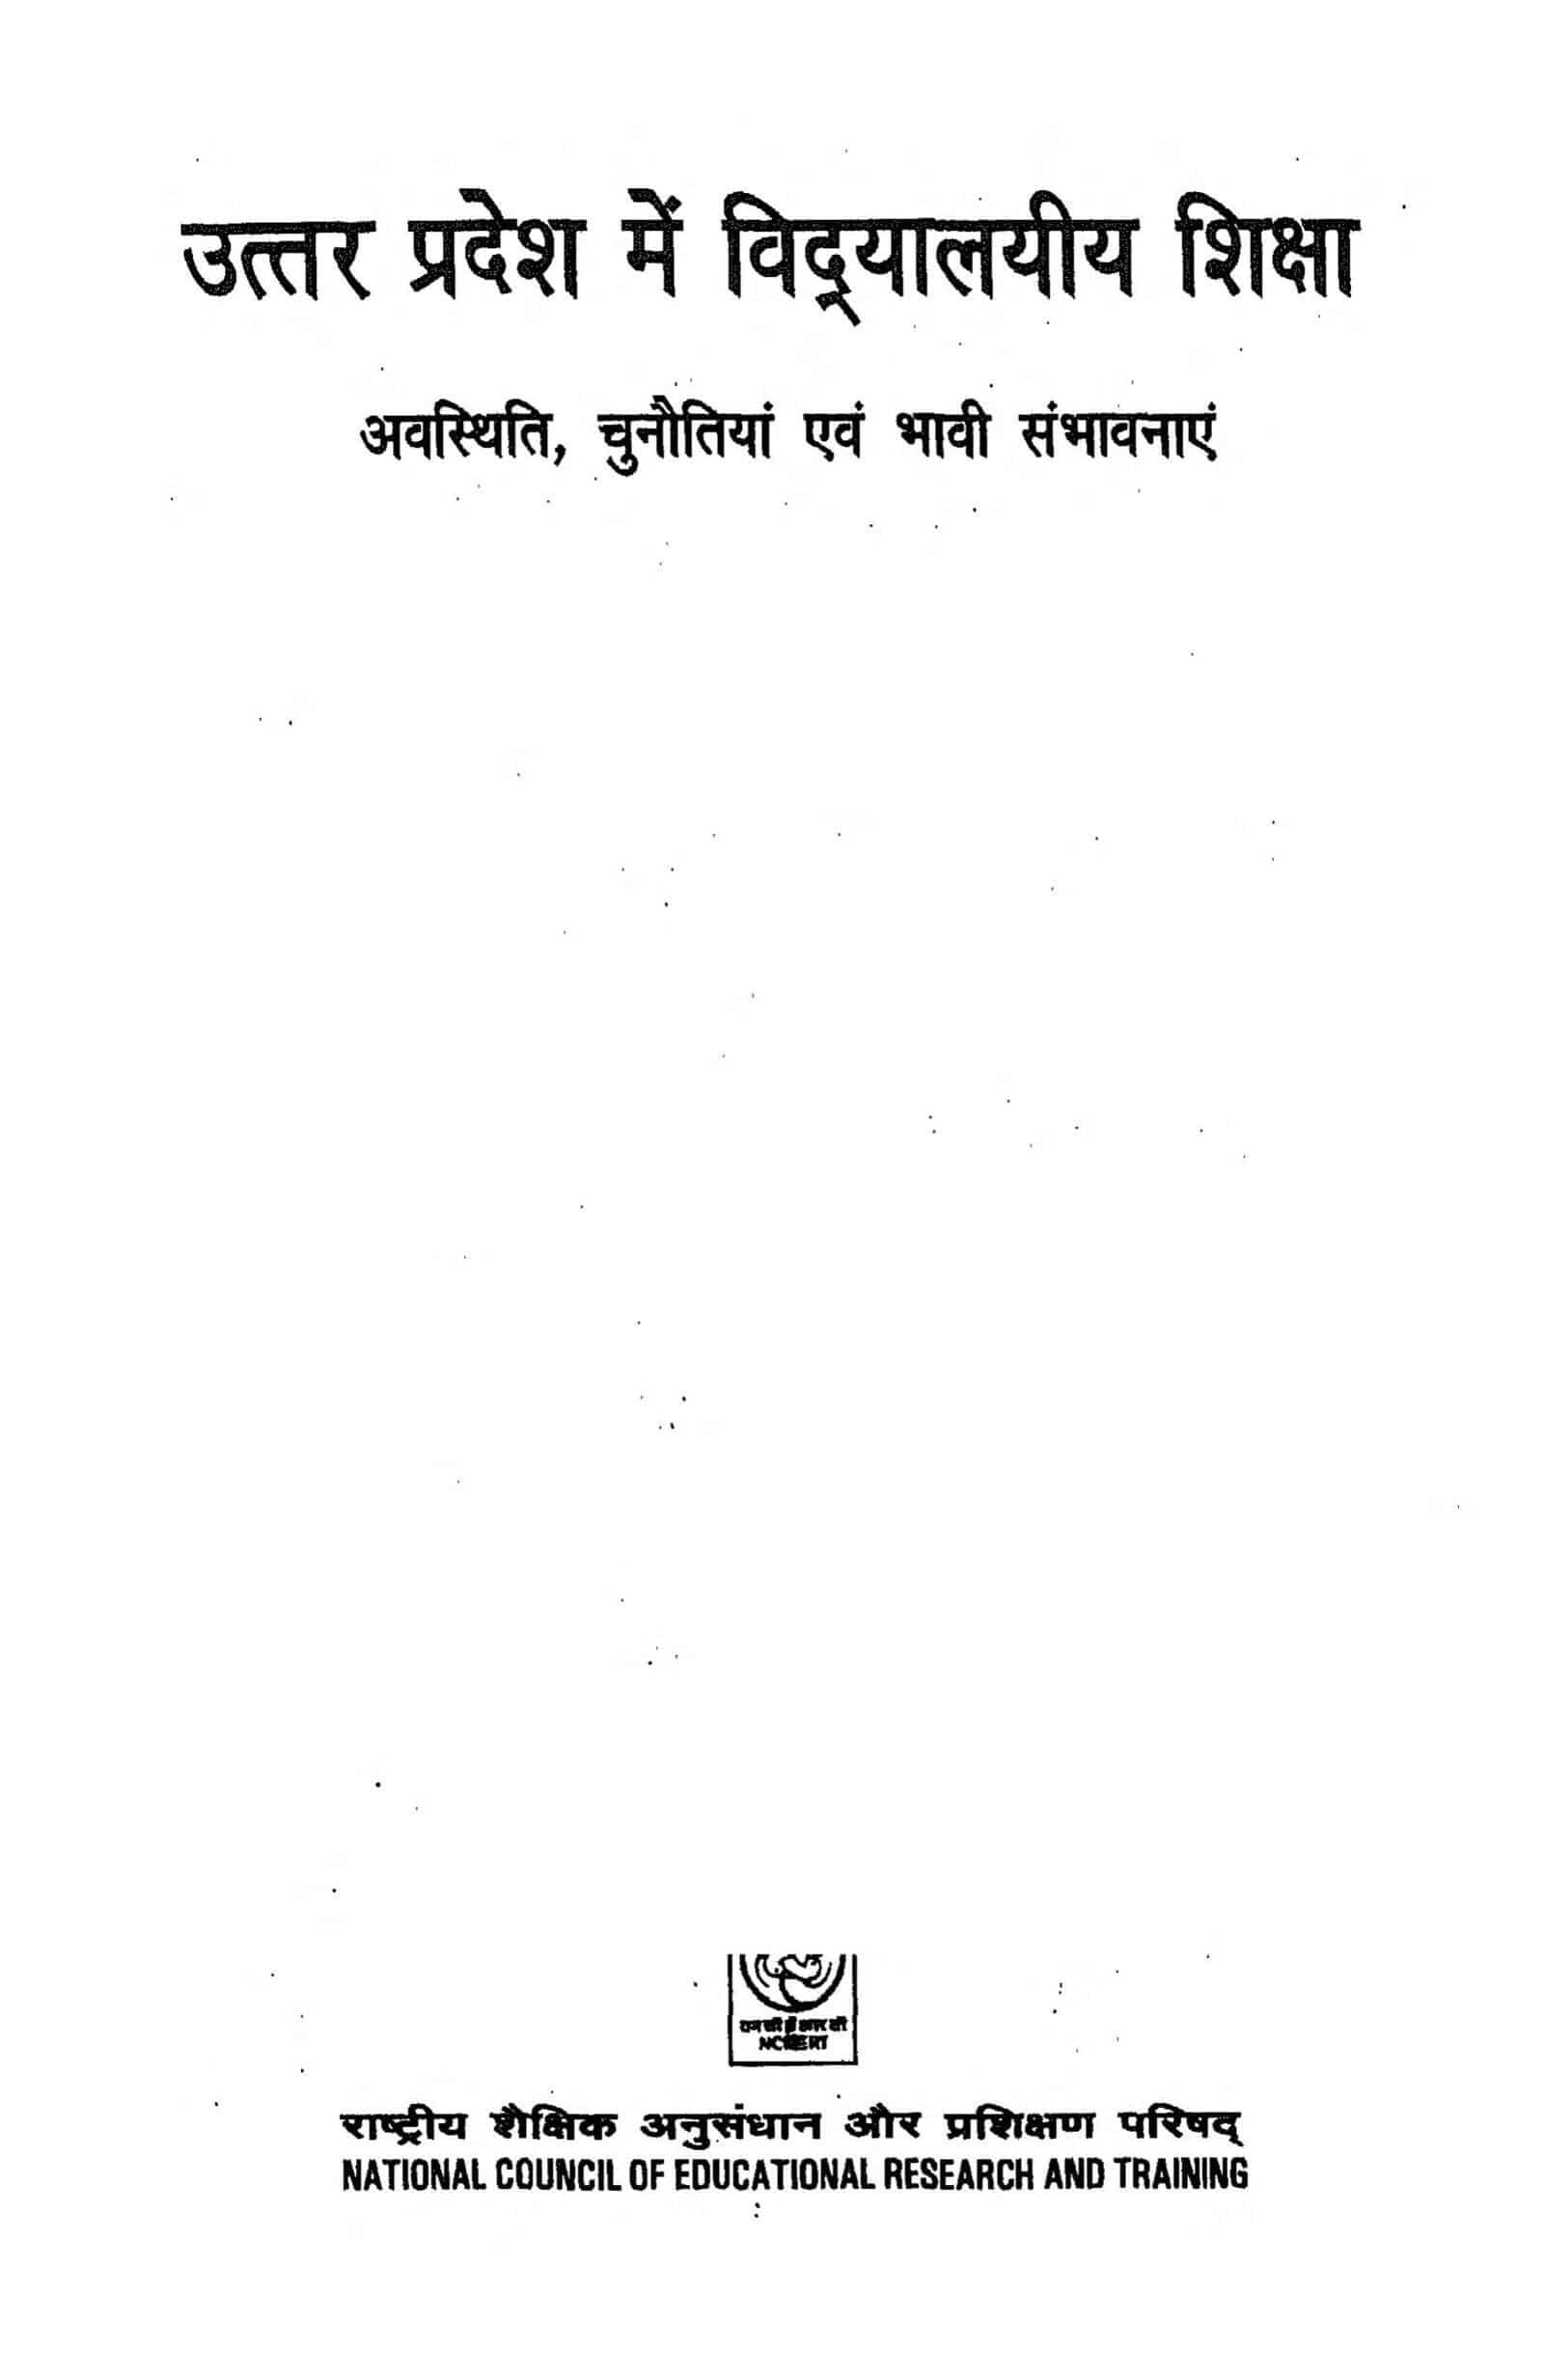 Book Image : उत्तर प्रदेश में विद्यालयीय शिक्षा  - Utter Pradesh Main Vidyalai Shiksha